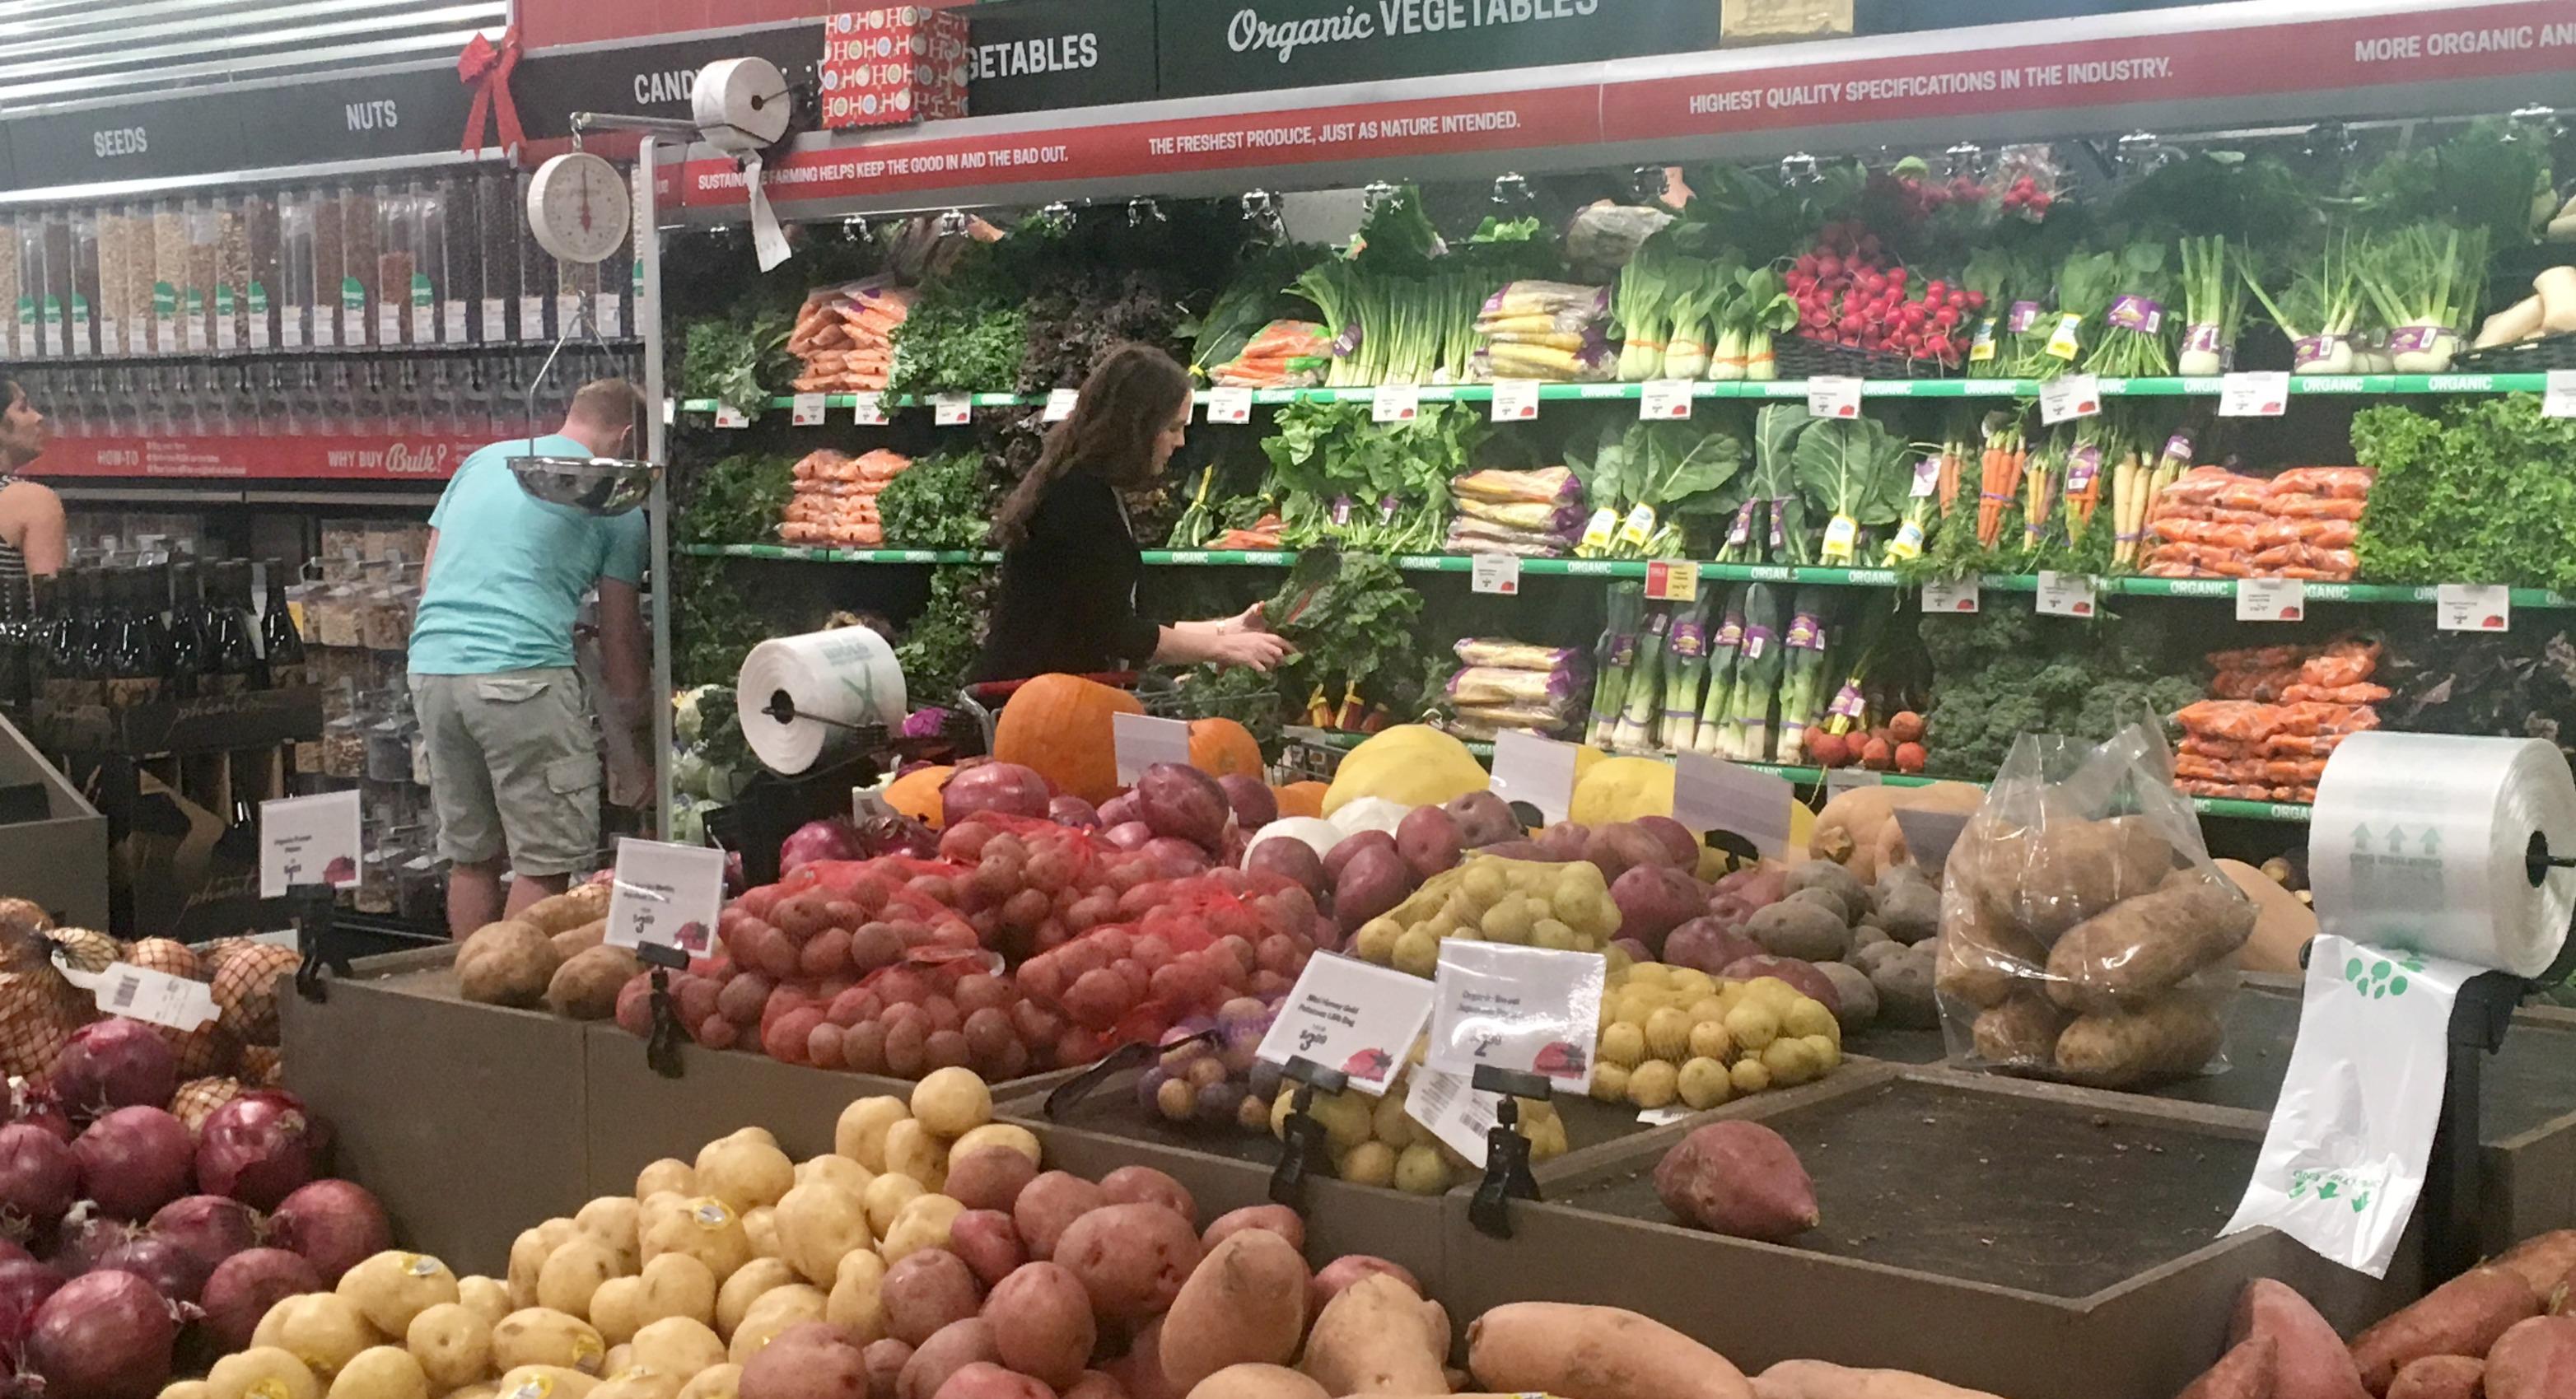 veggie herb tips ideas hacks